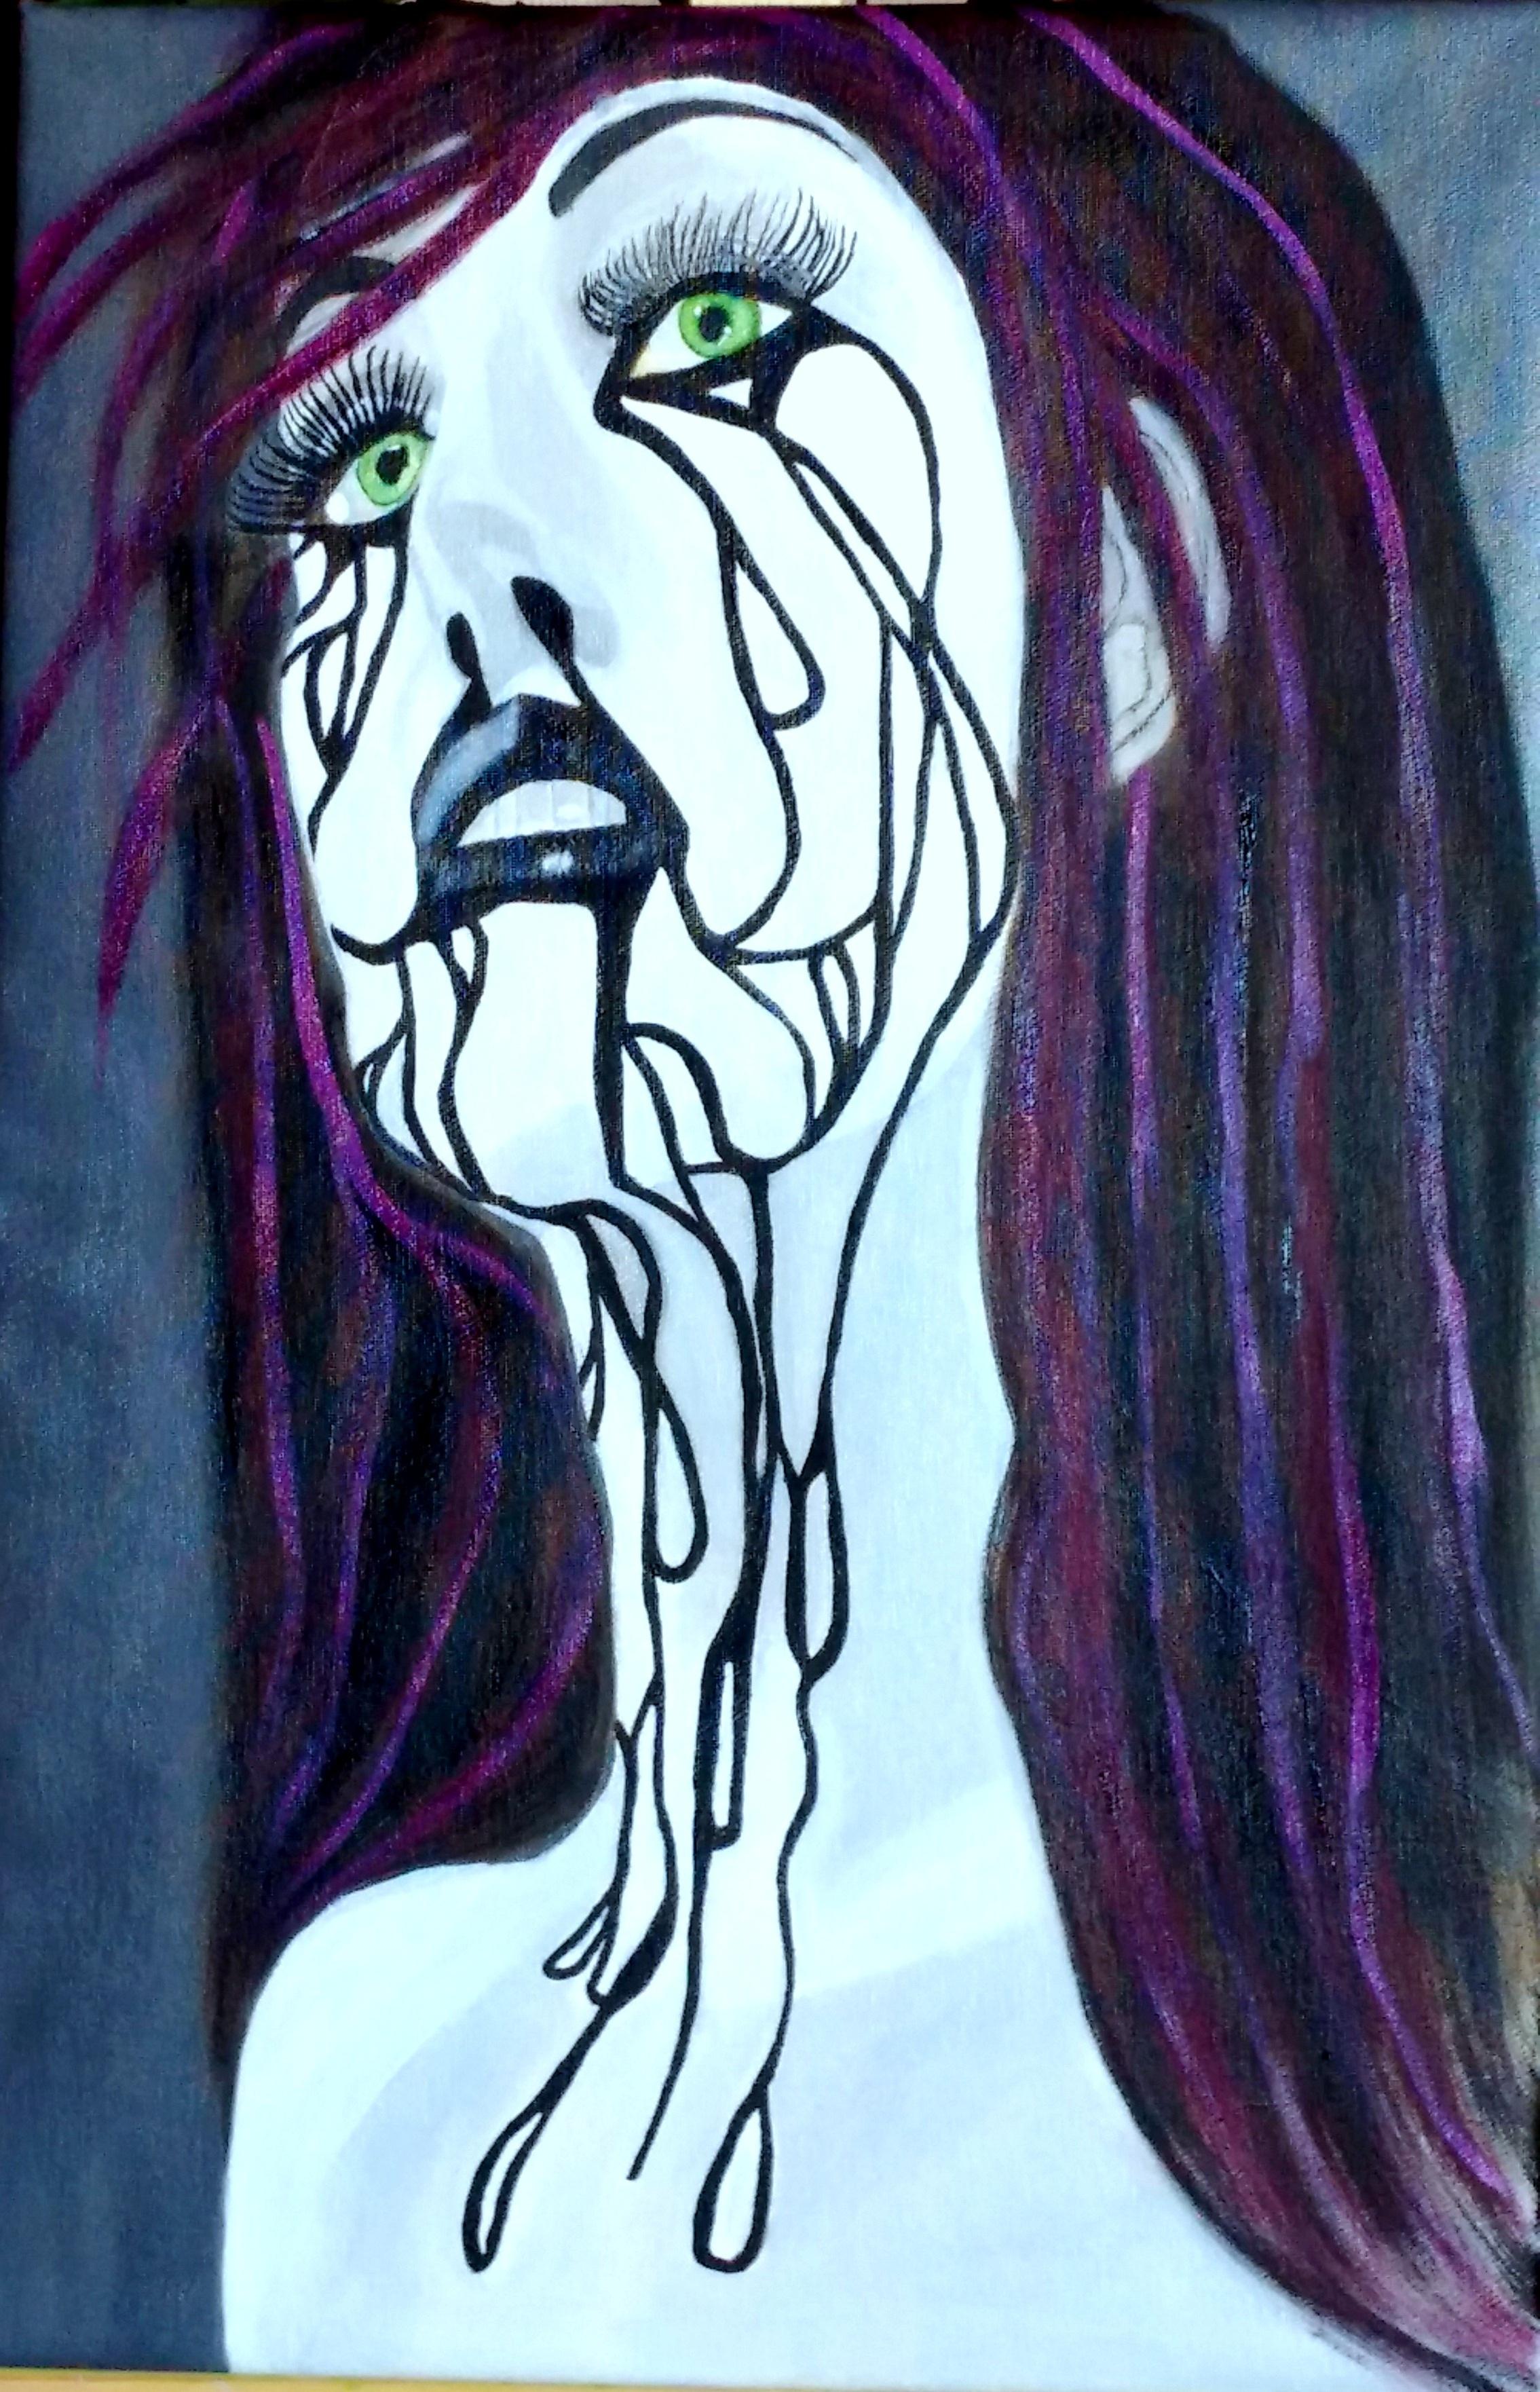 Gambar Wanita Ungu Jendela Warna Halloween Bahan Gotik